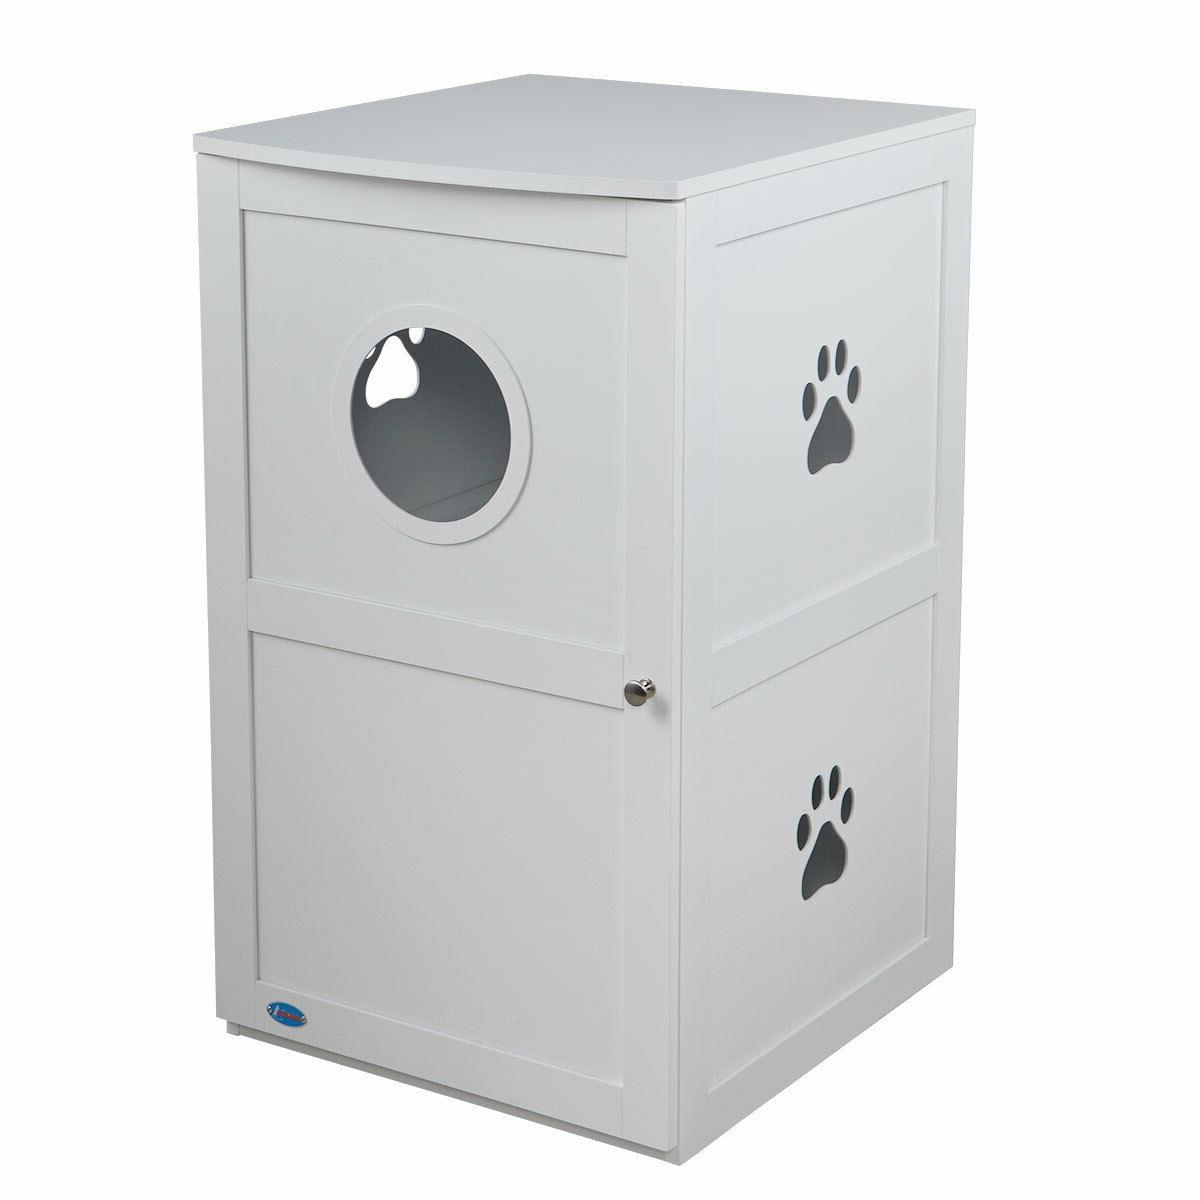 White 2-Tier Cat box Pets Nightstand Enclosure